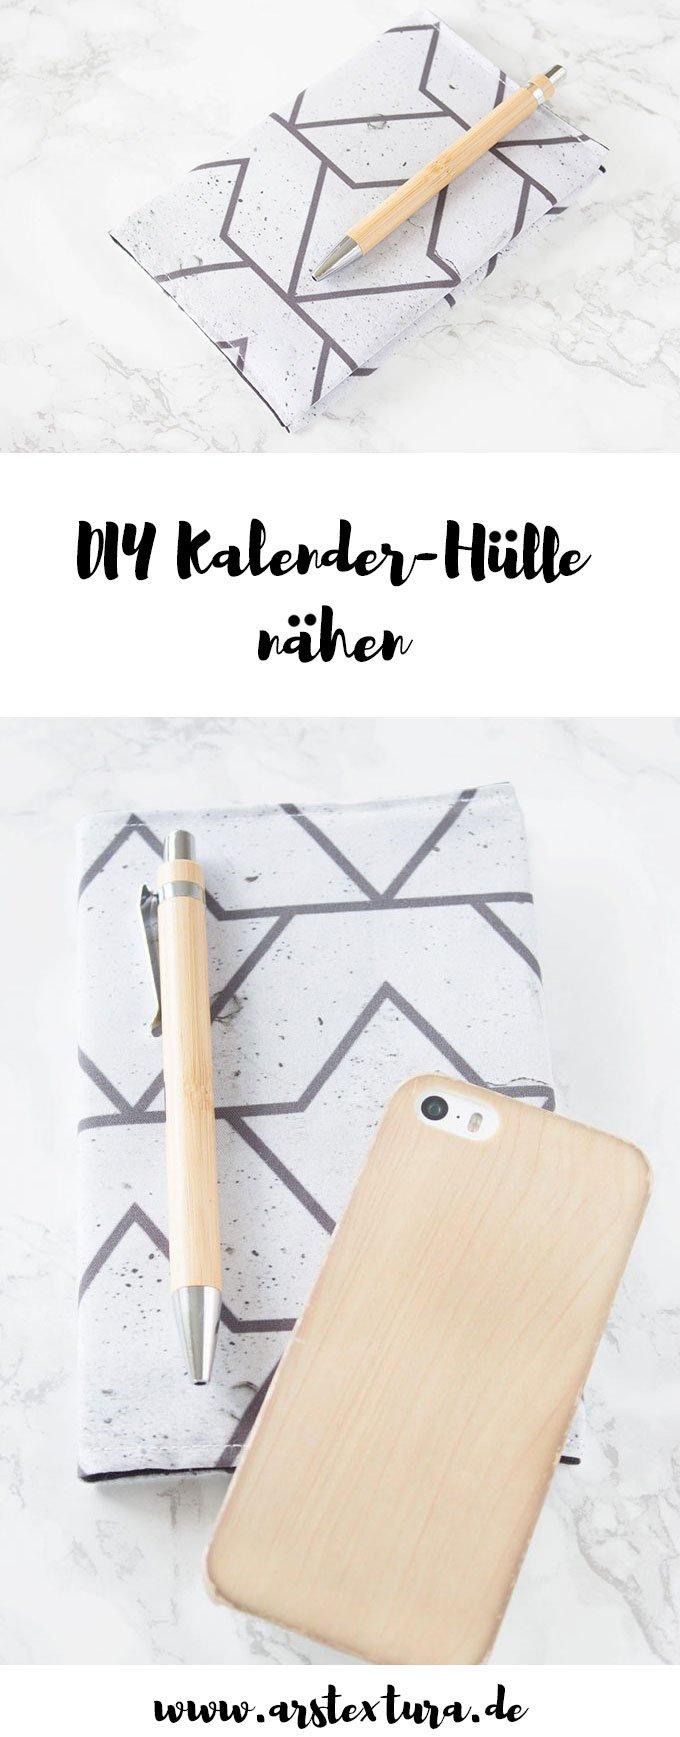 DIY Geschenk | Kalender Hülle nähen mit Anleitung